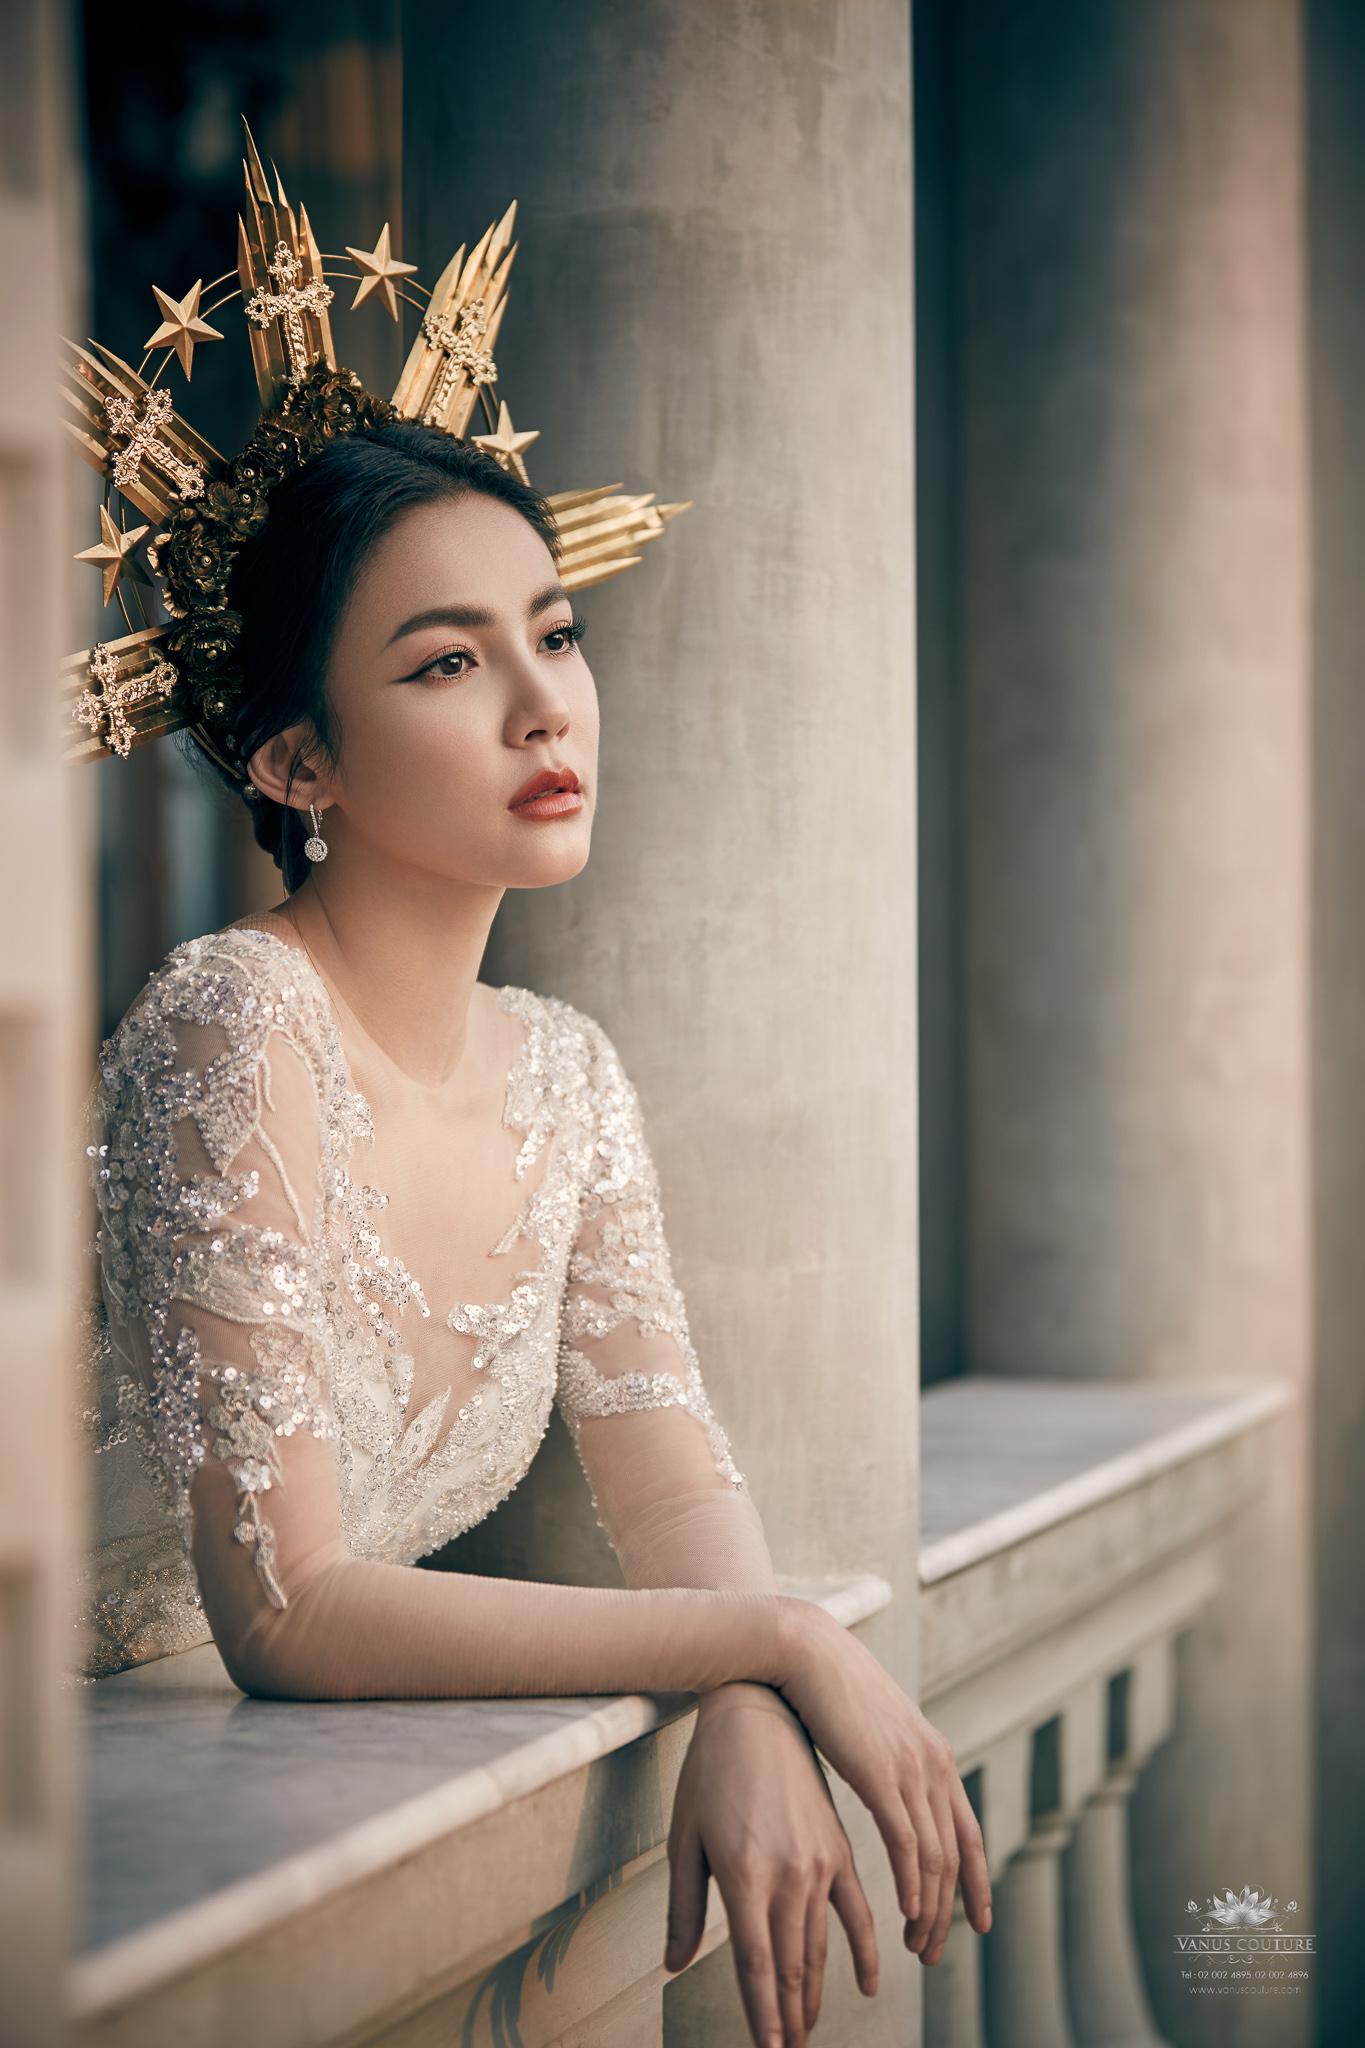 Superball wedding dress - Gybzy 06